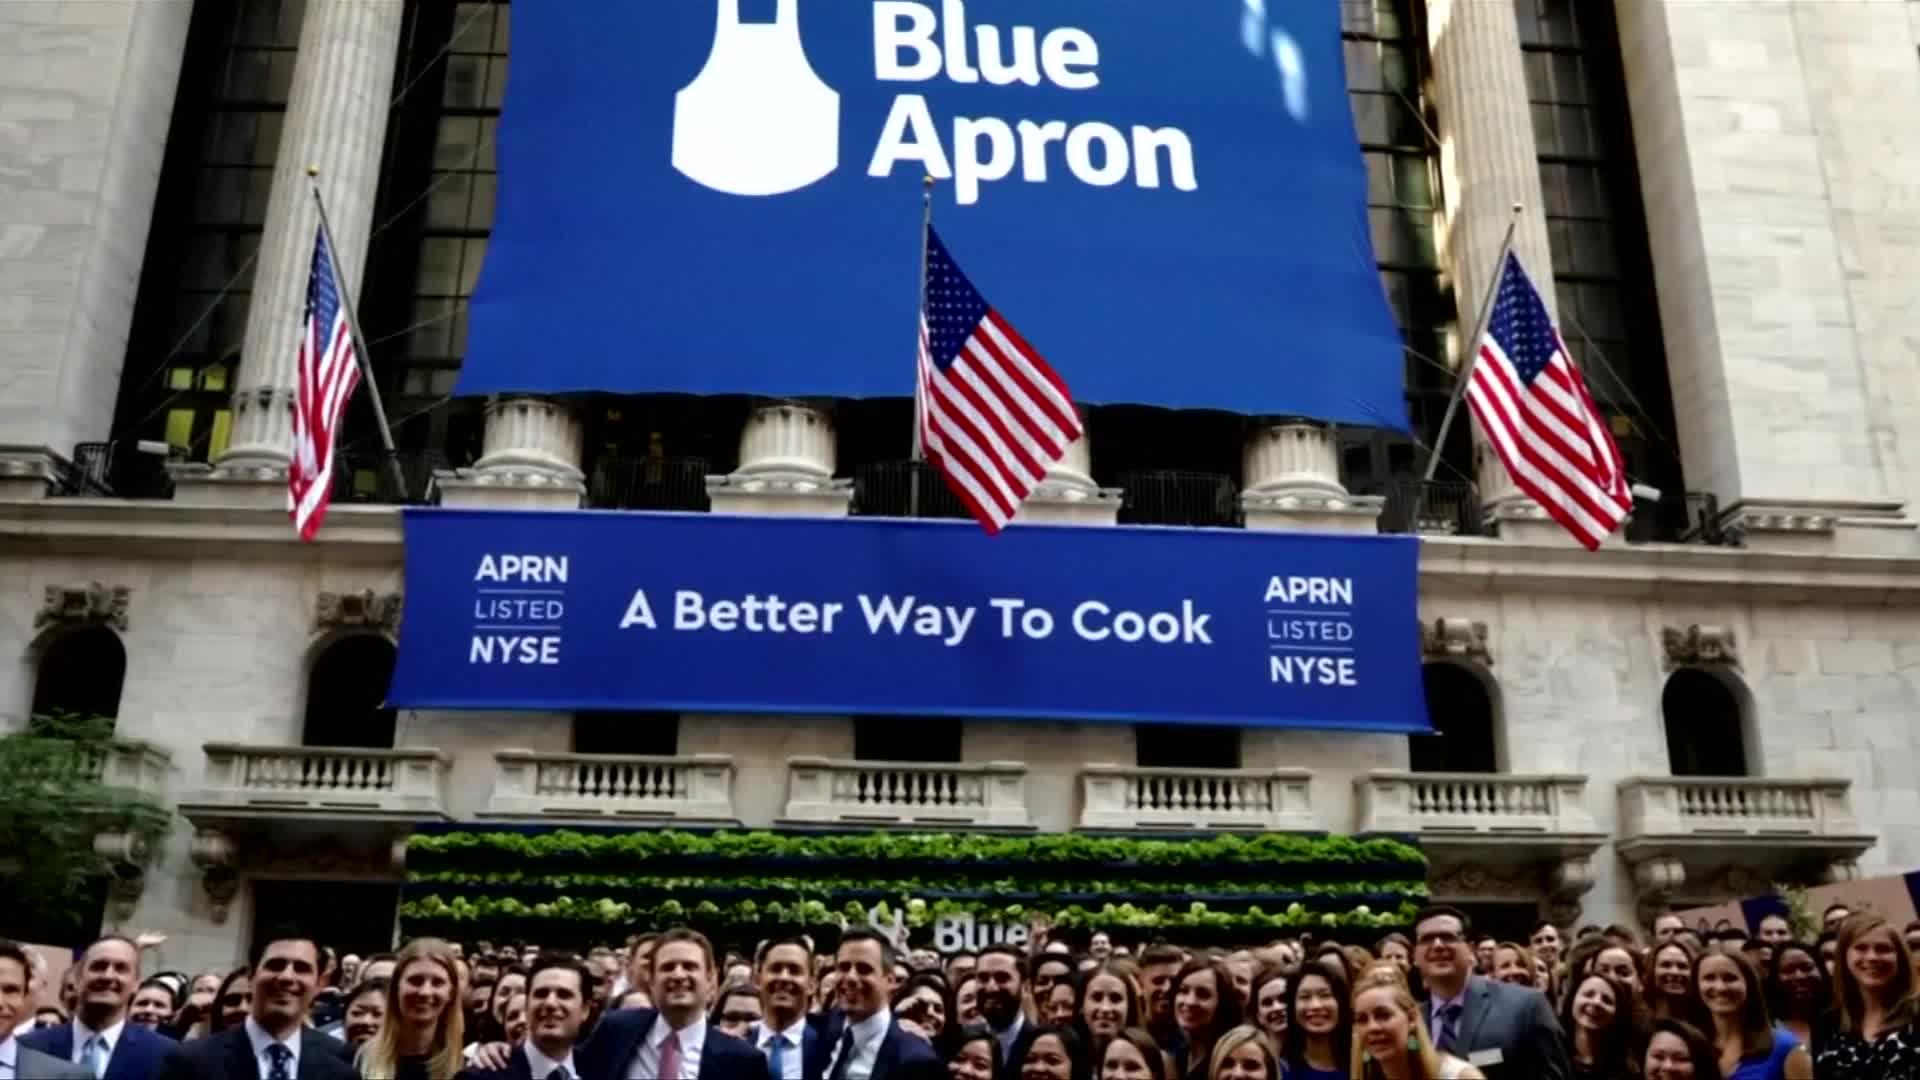 Blue apron ipo bank